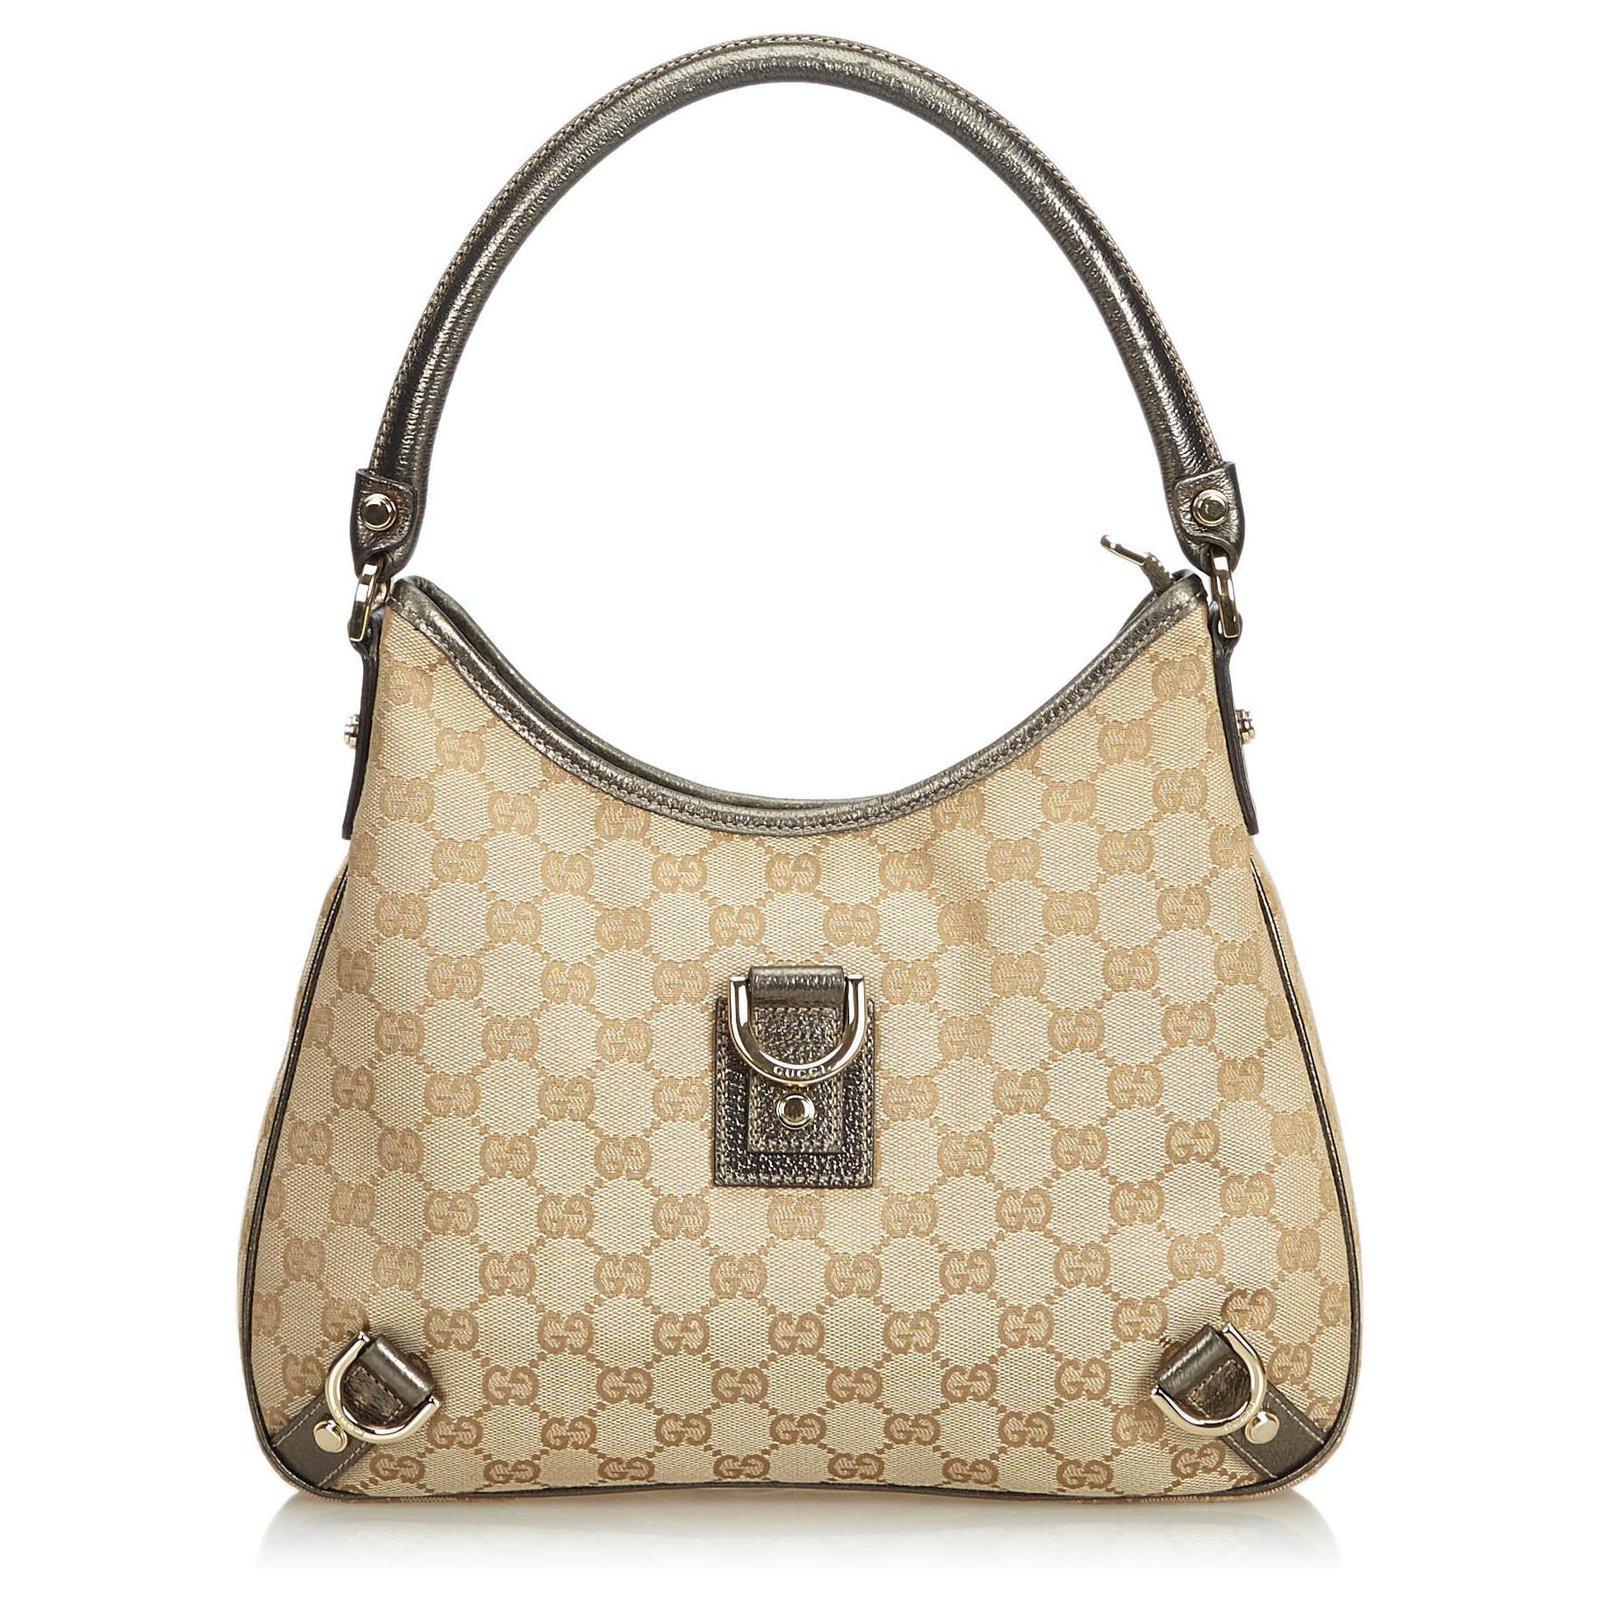 22c657f9ed2 Gucci GG Jacquard Abbey Shoulder Bag Handbags Leather